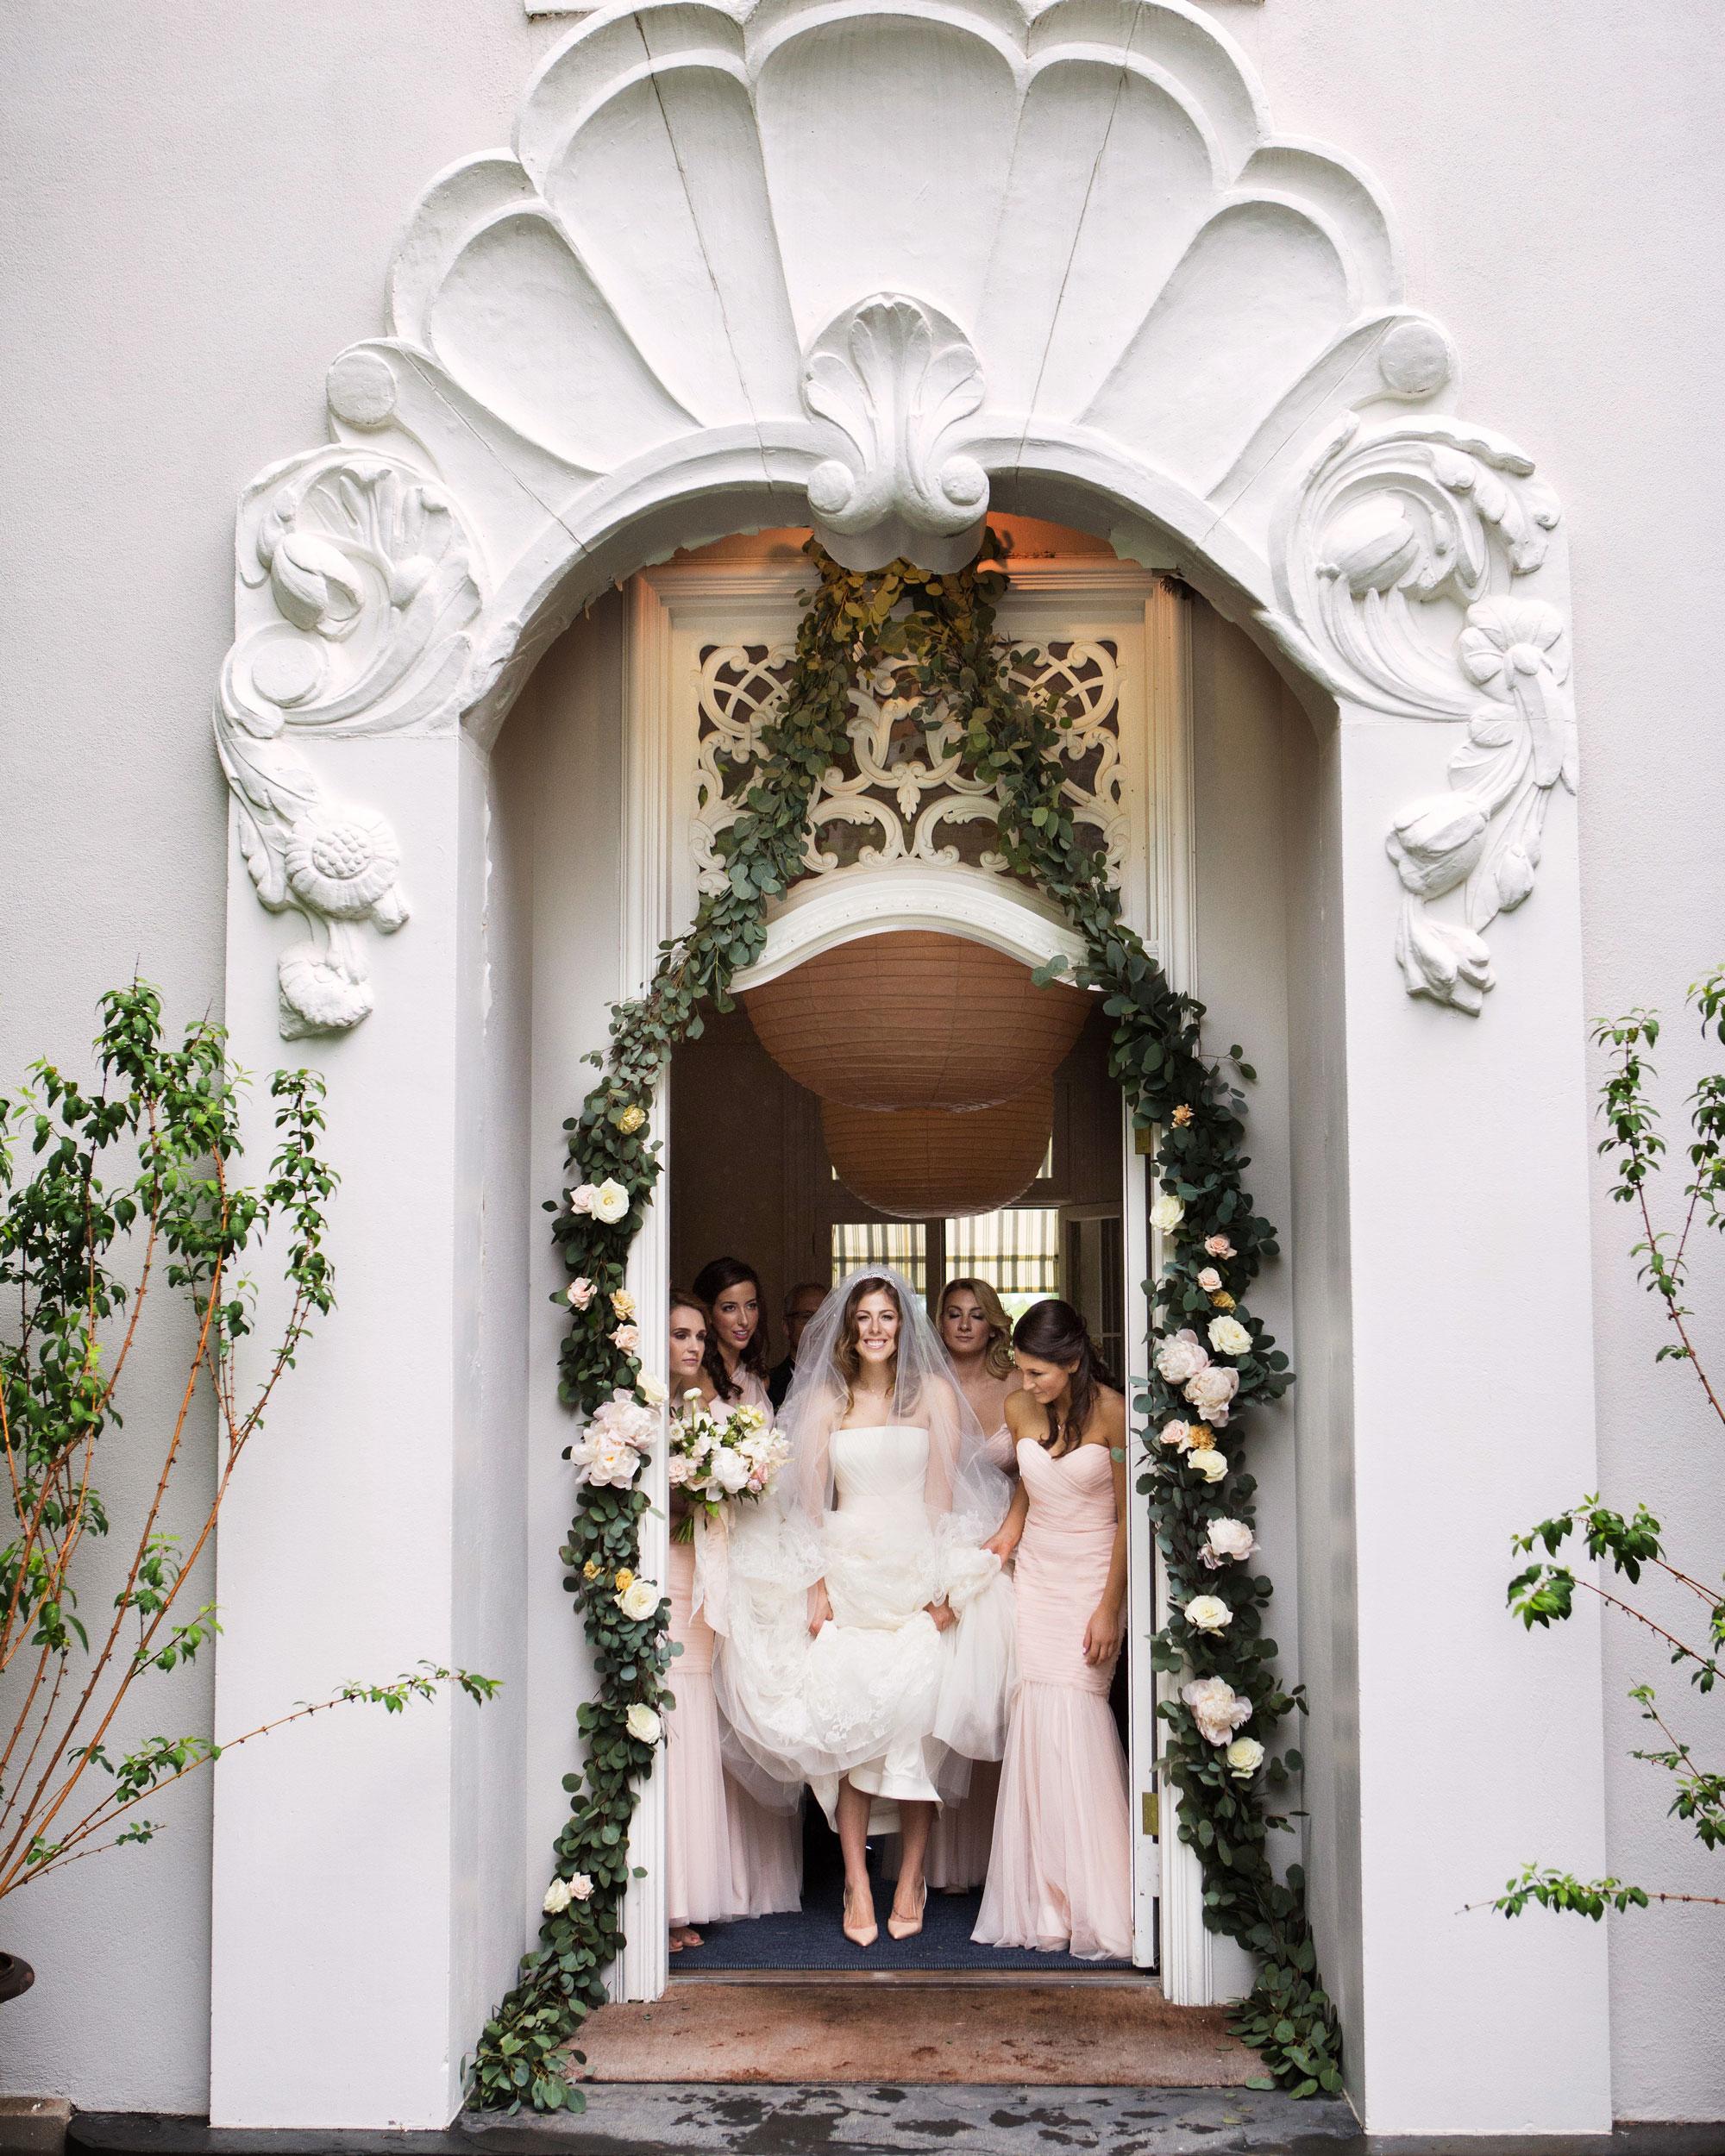 kaitlyn-robert-wedding-bridemsaids-0057-s112718-0316.jpg